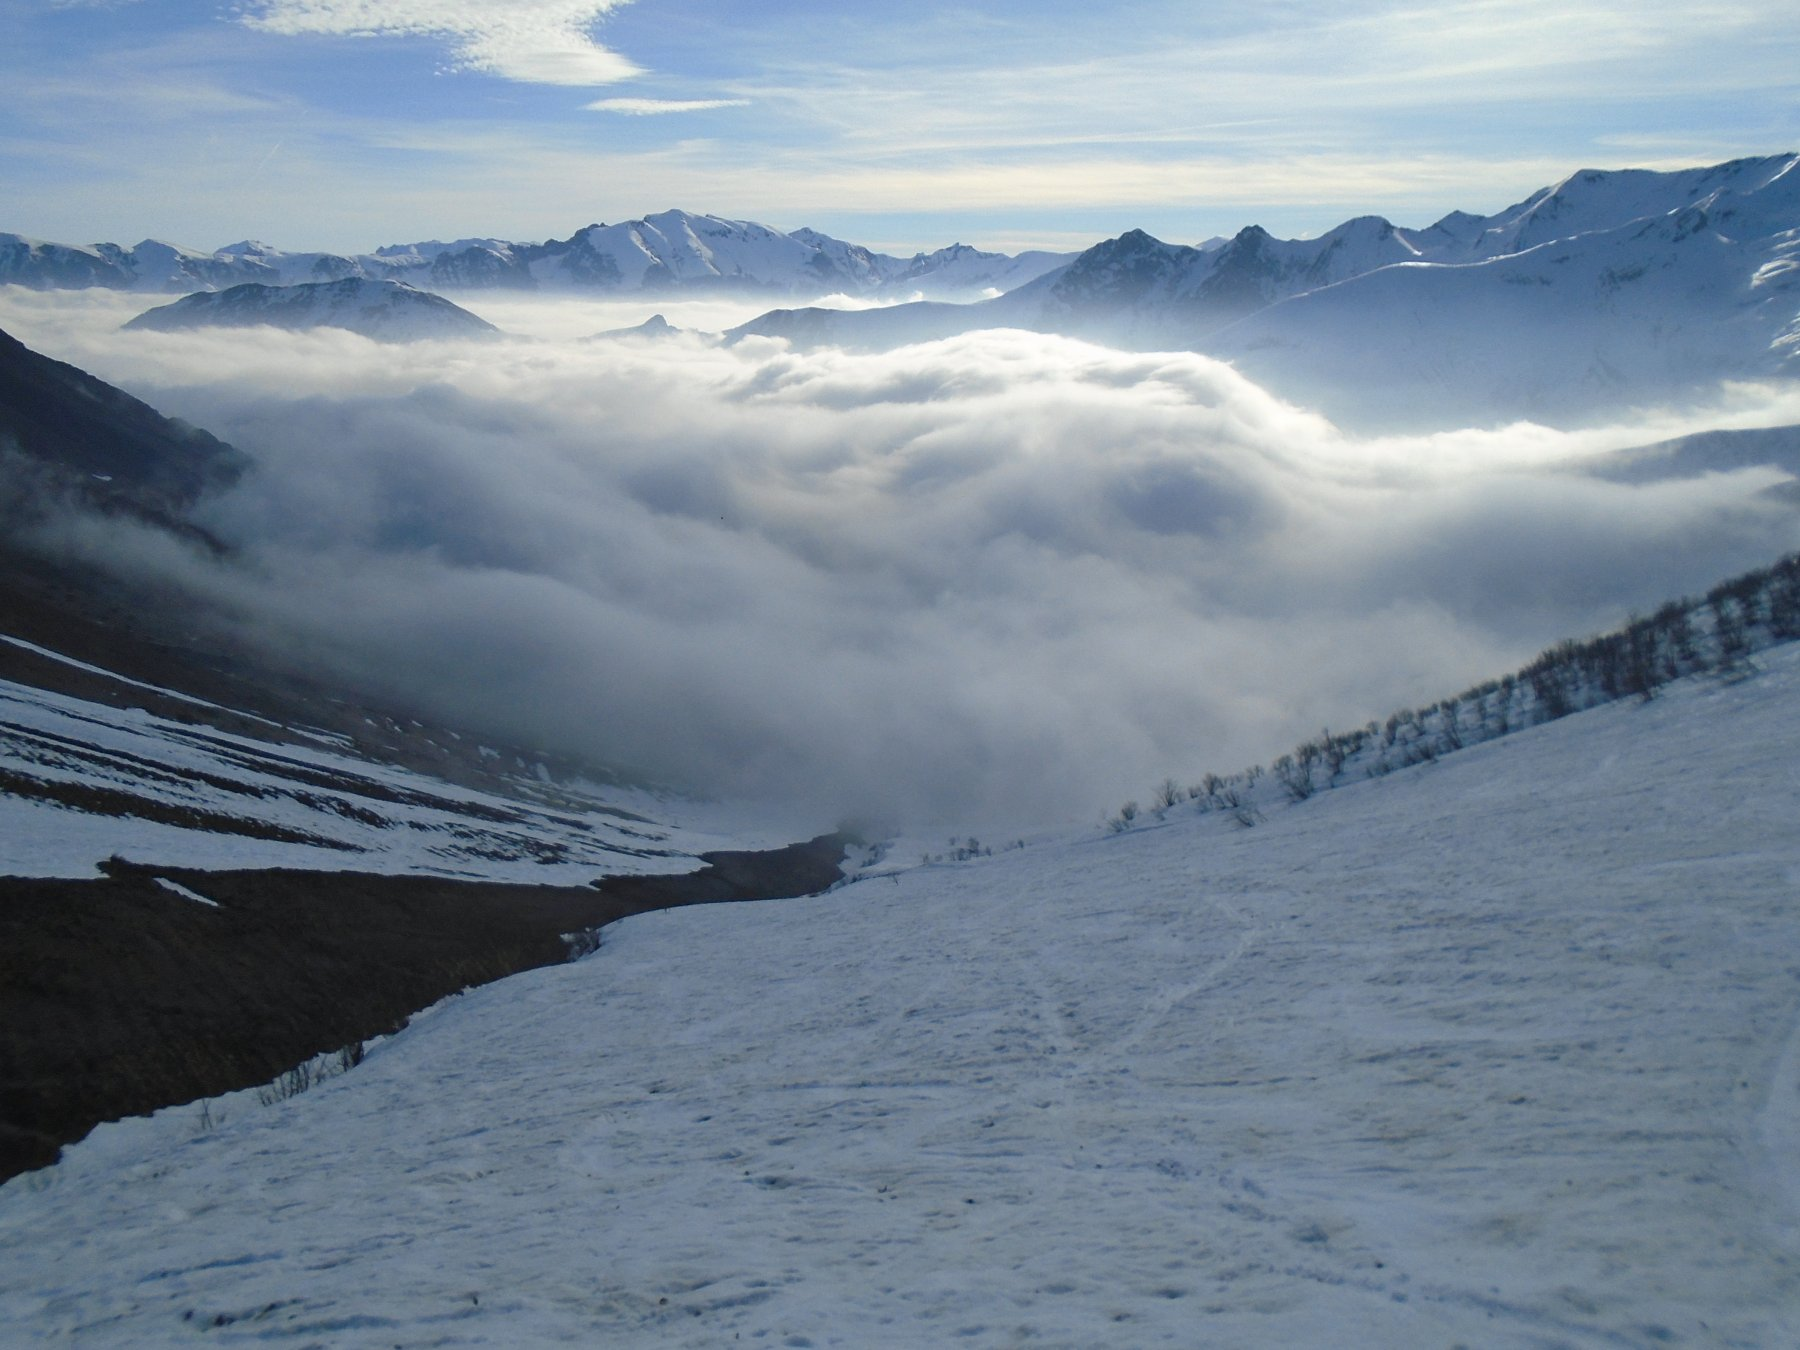 Nebbia in basso